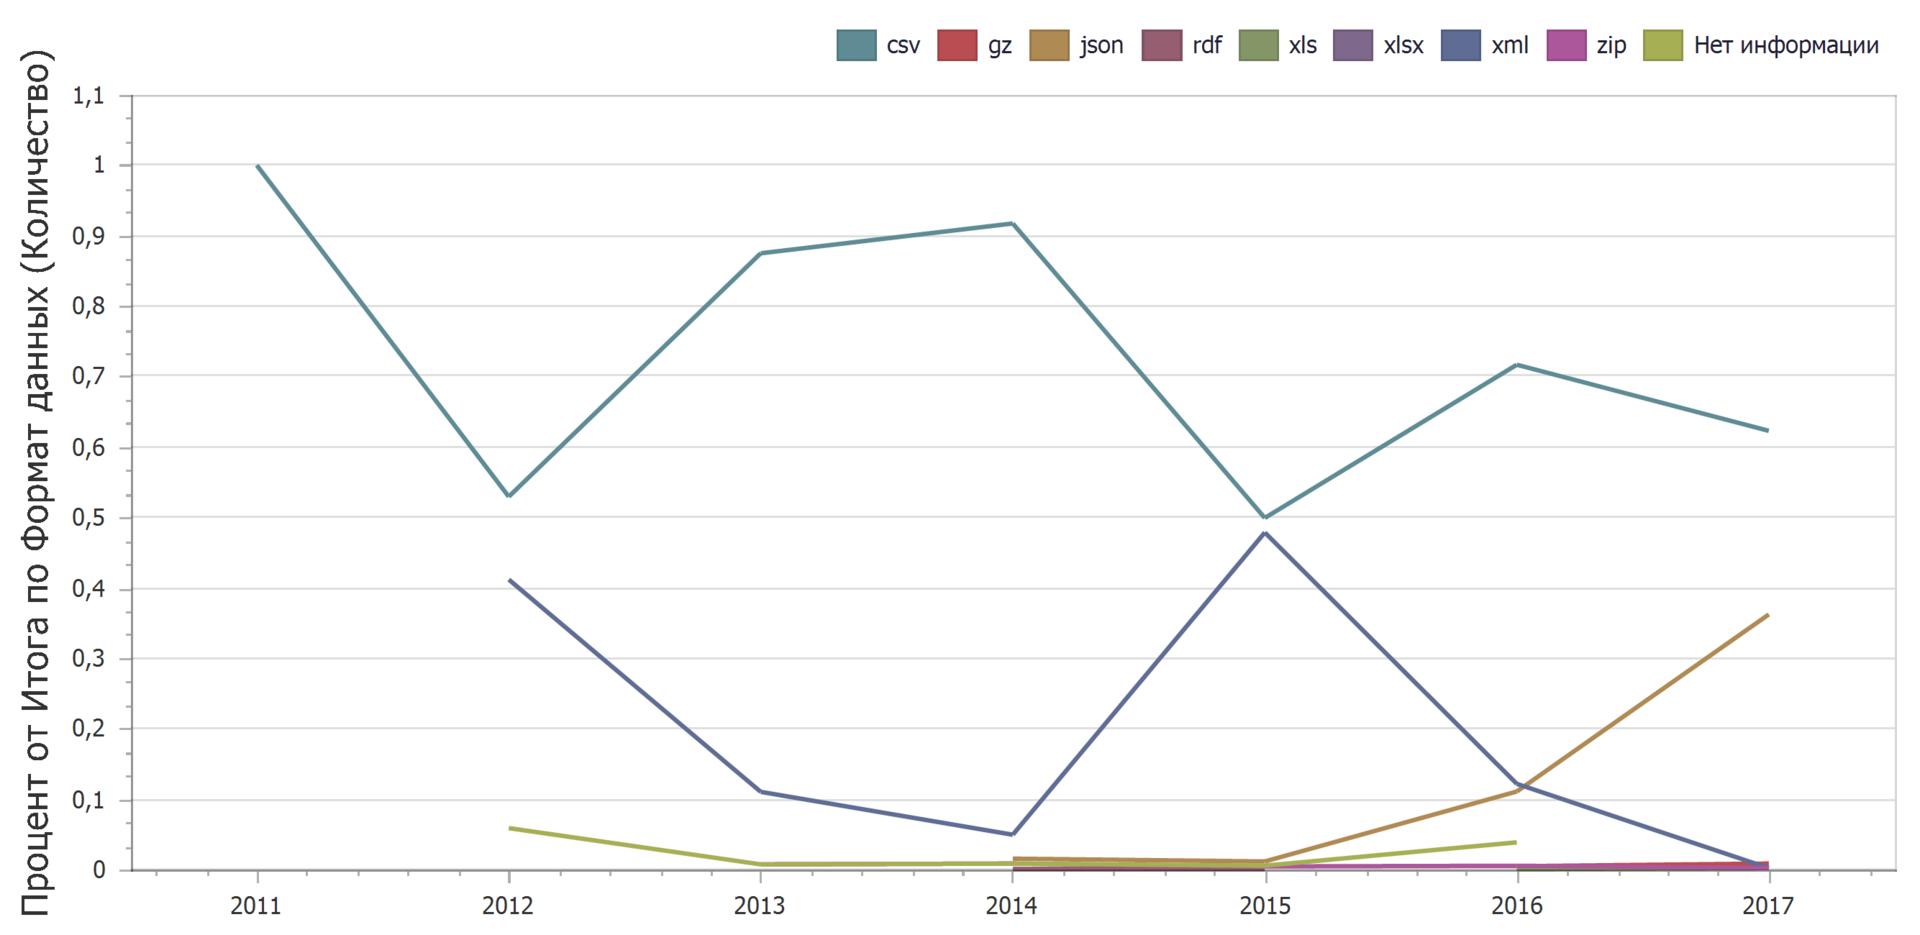 Анализ наборов данных с портала открытых данных data.gov.ru - 11